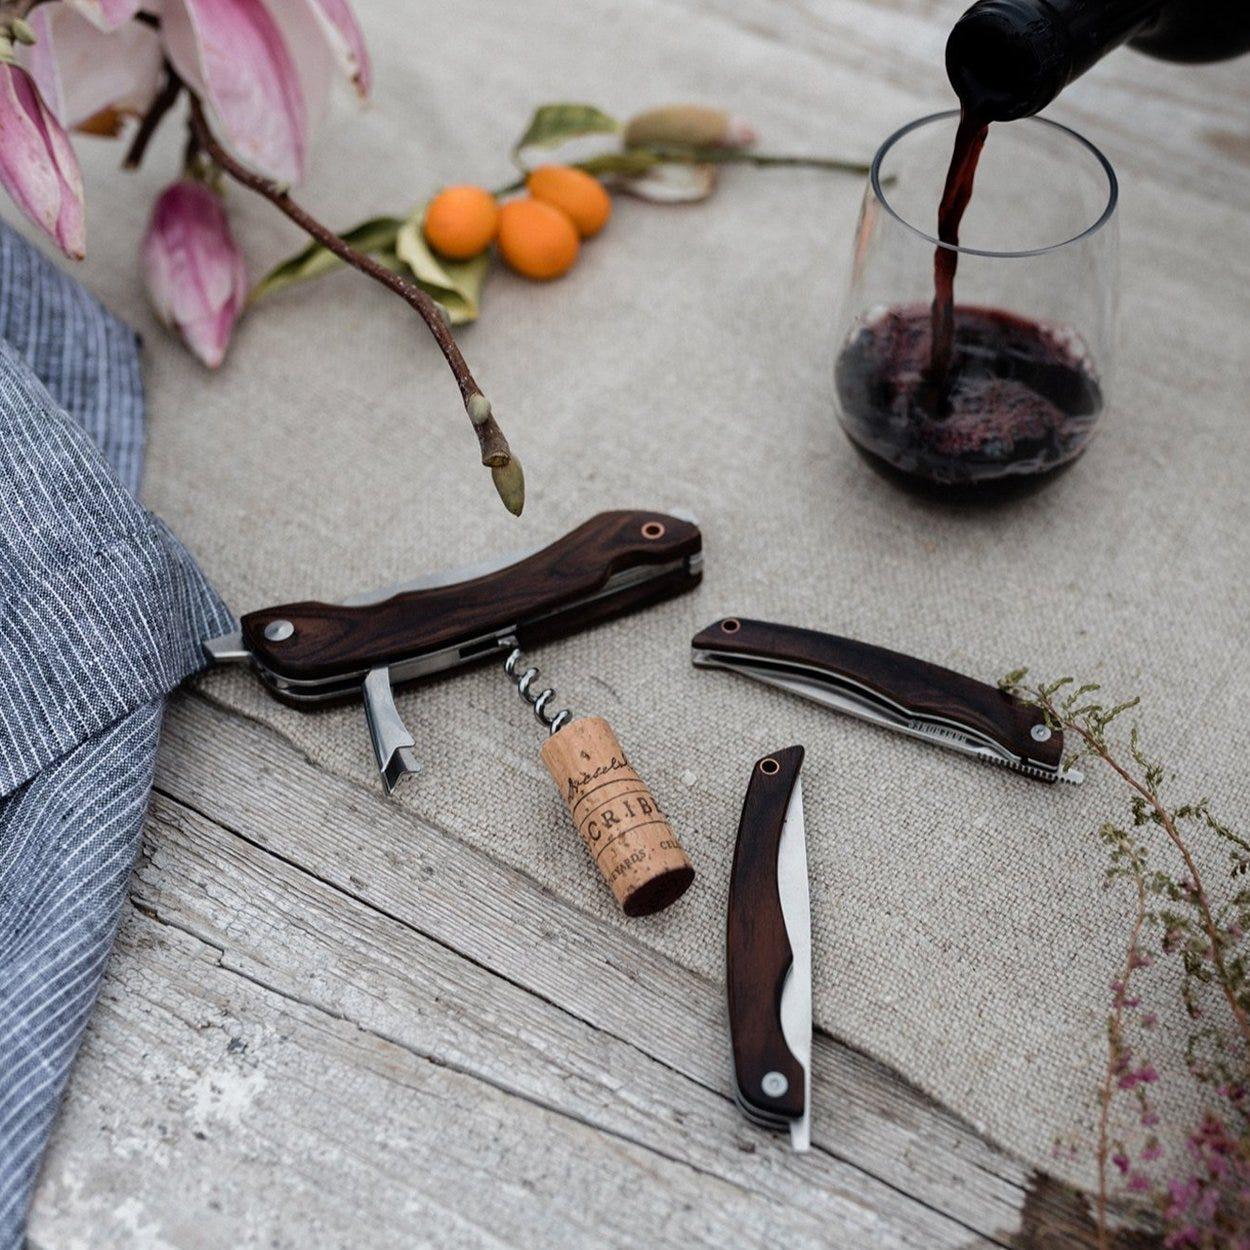 Folding Picnic Knife - Cool Material